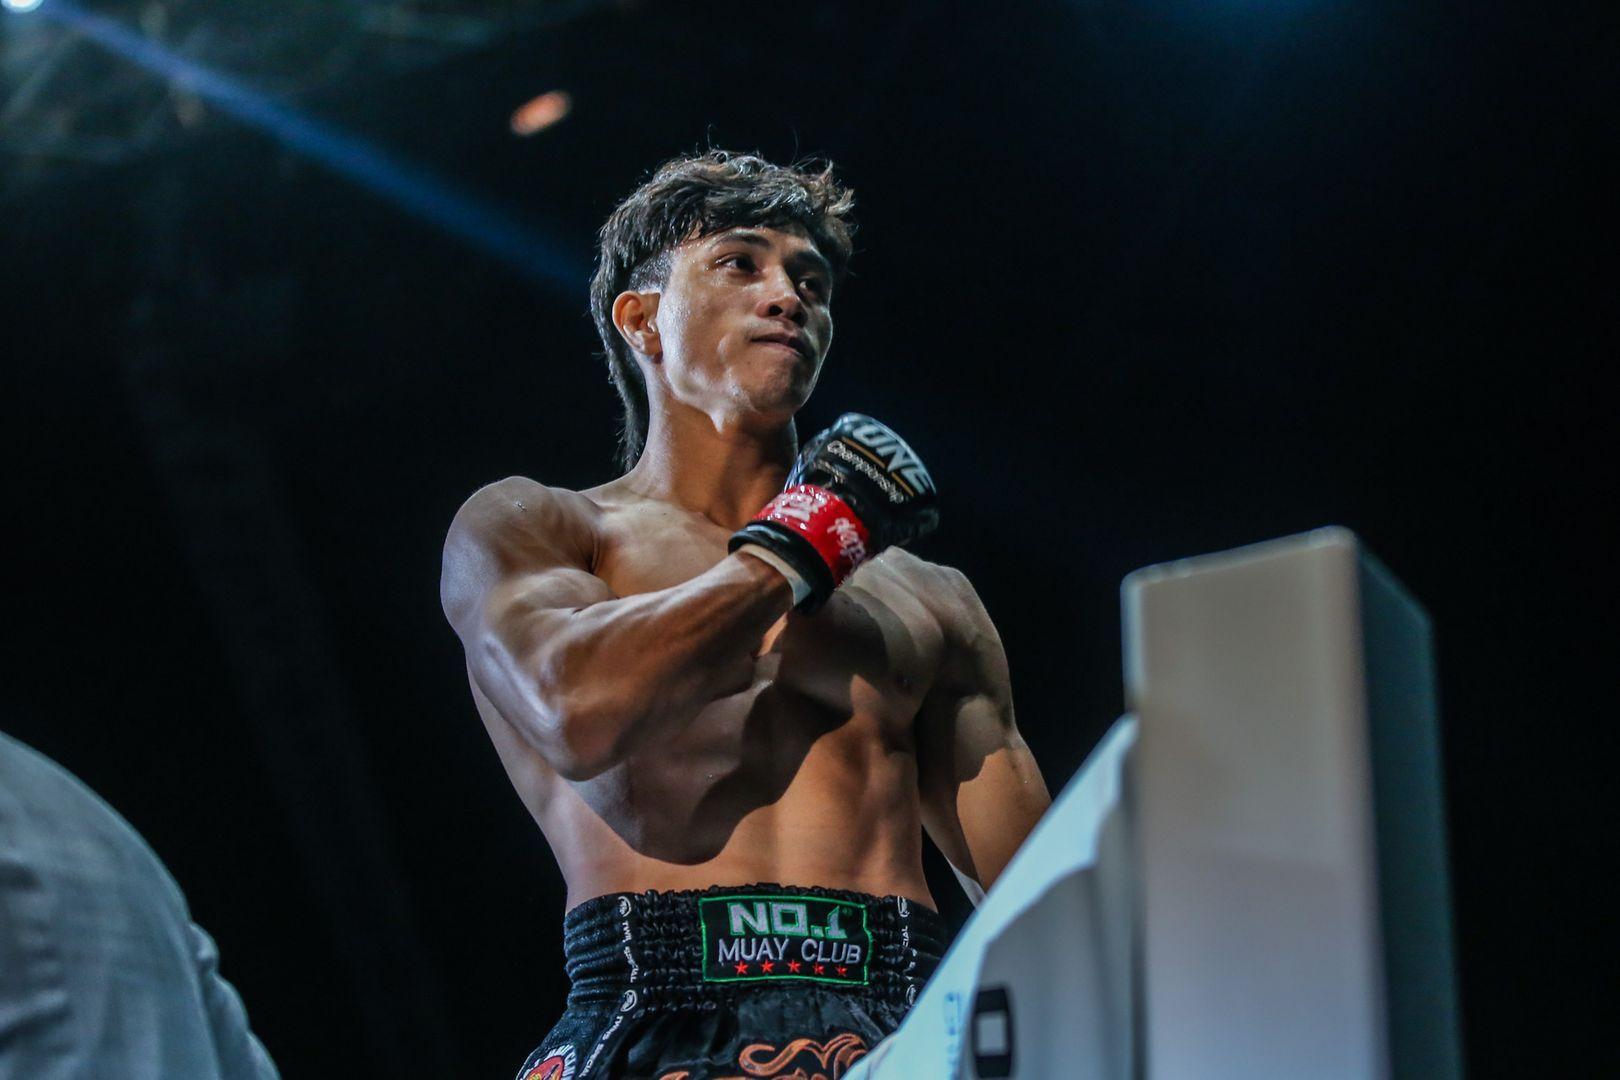 Vietnamese Muay Thai striker Nguyen Tran Du Nhat